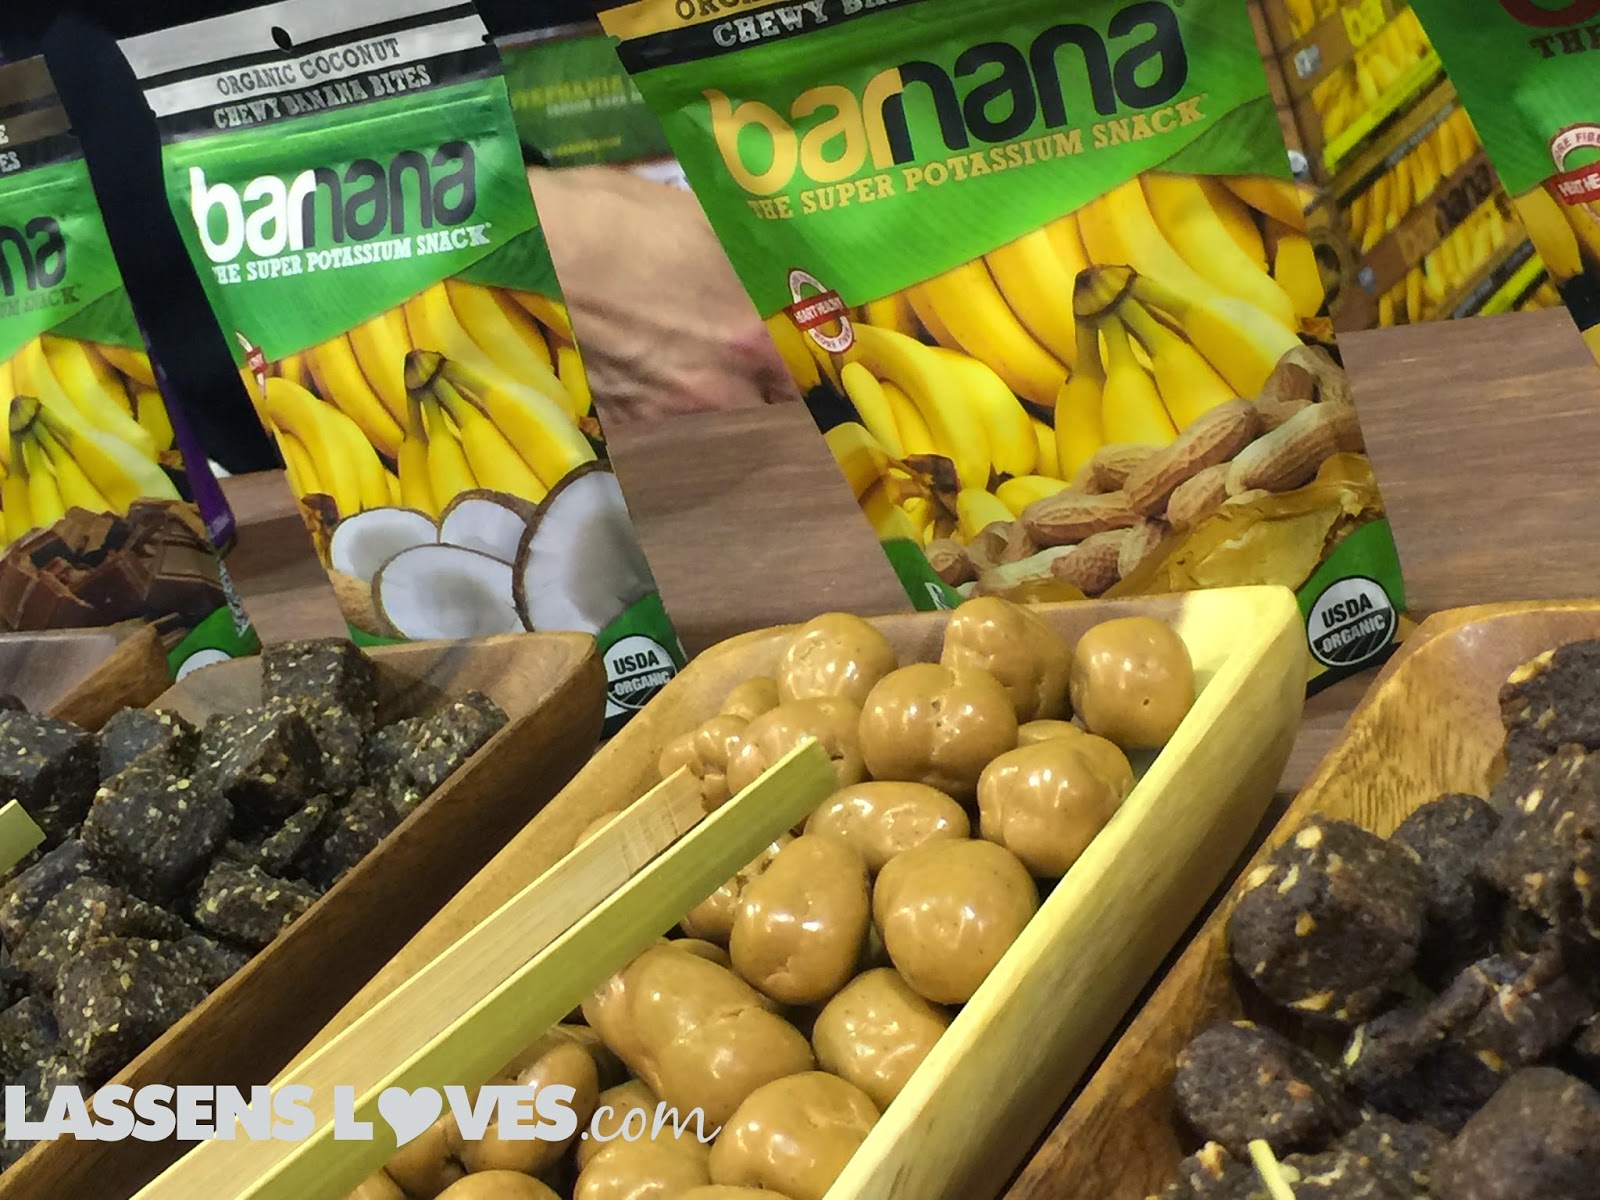 Expo+West+2015, Natural+Foods+Show, New+Natural+Products, barnana+snacks, banana+snacks